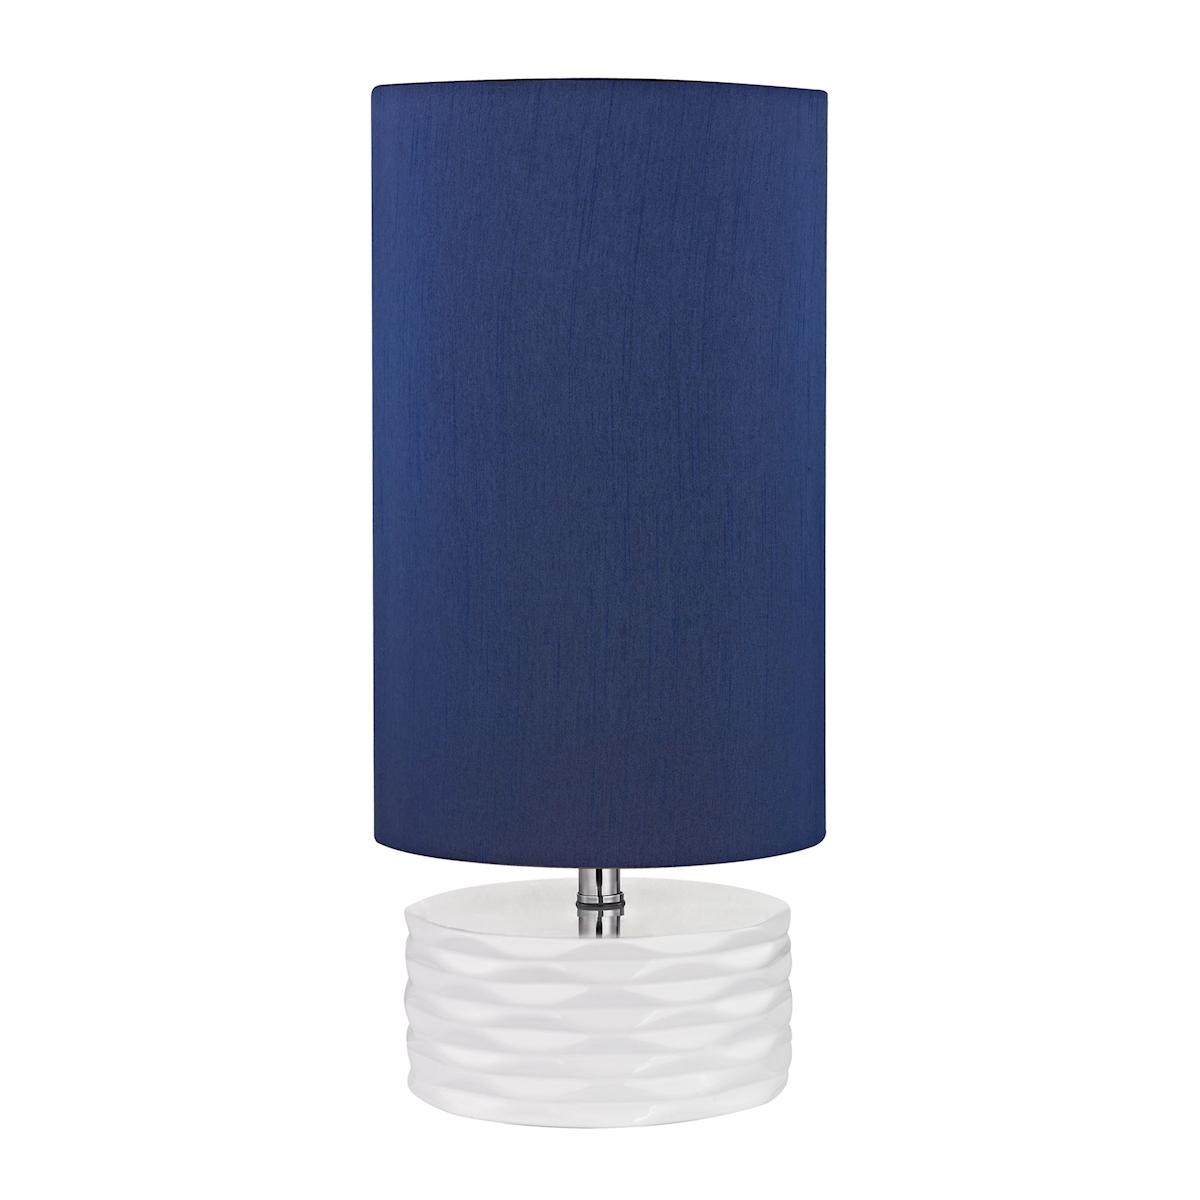 Dimond Tamworth 18 Ceramic Table Lamp in White